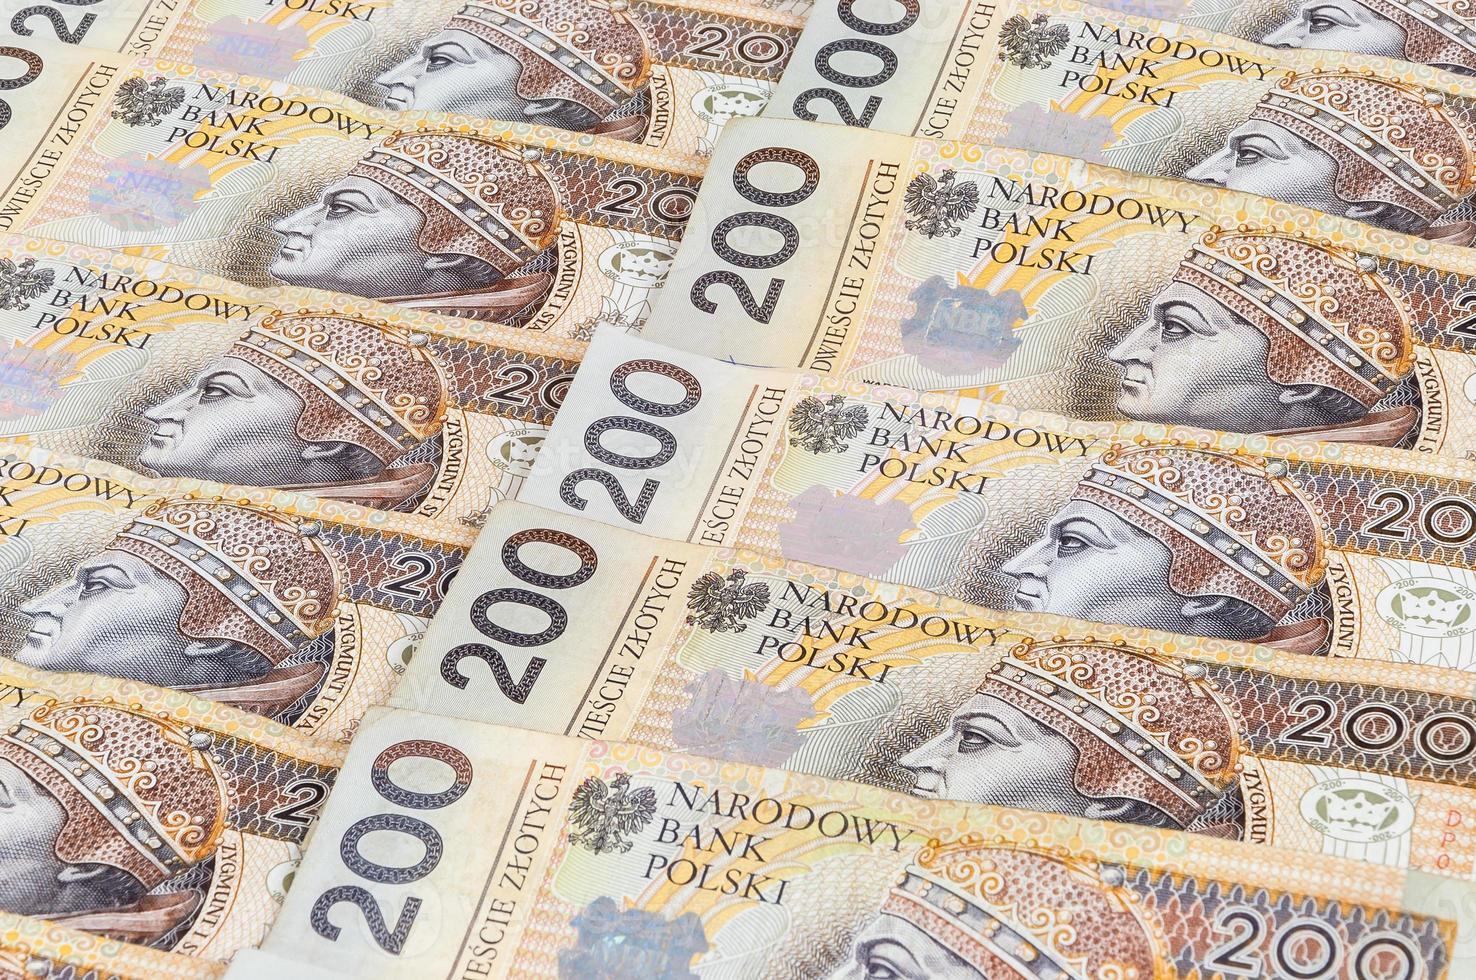 billetes de 200 pln - zloty polaco foto